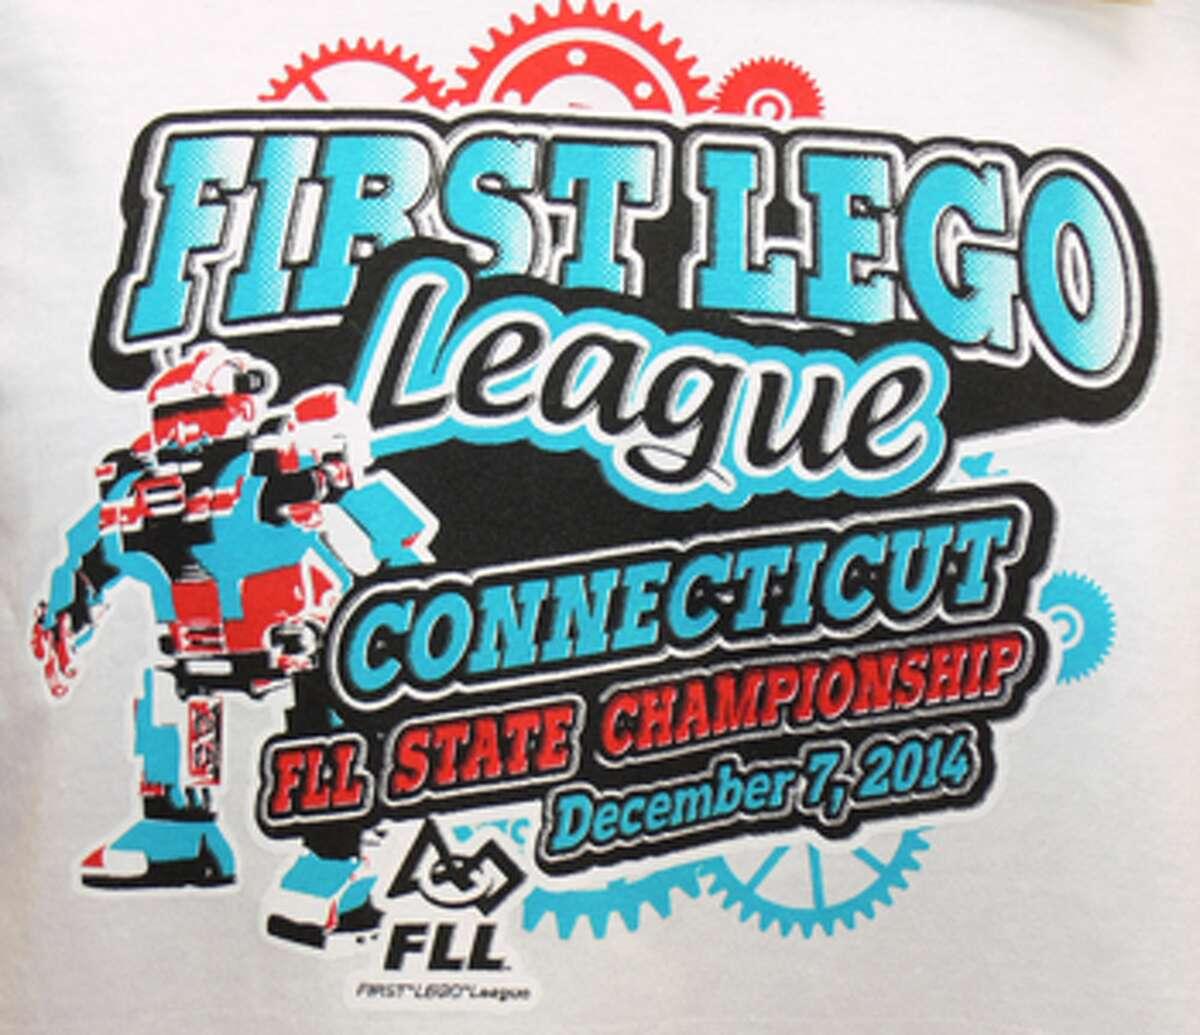 The statewide robotics tournament logo on a T-shirt.